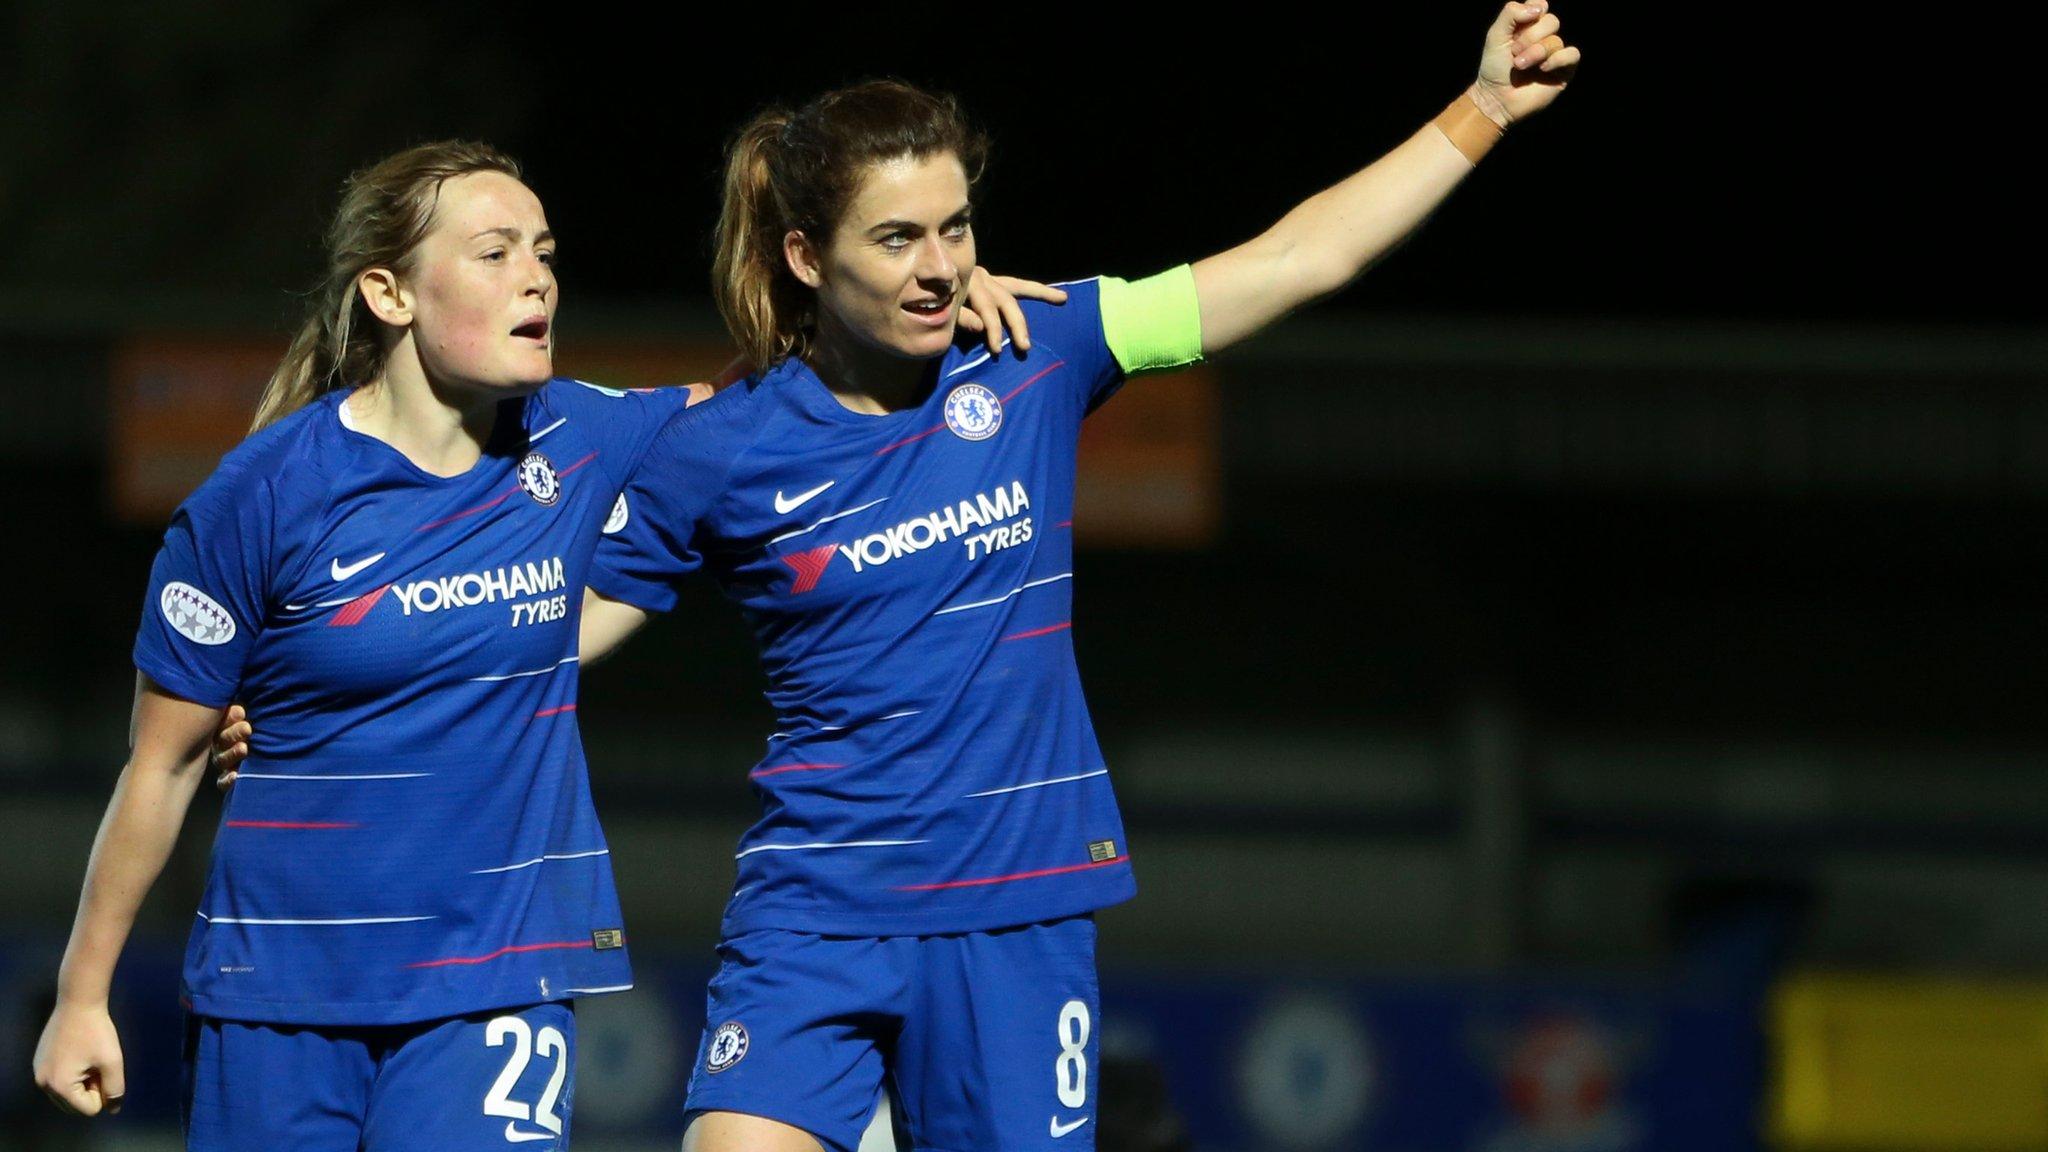 Chelsea take control of Champions League quarter-final against PSG